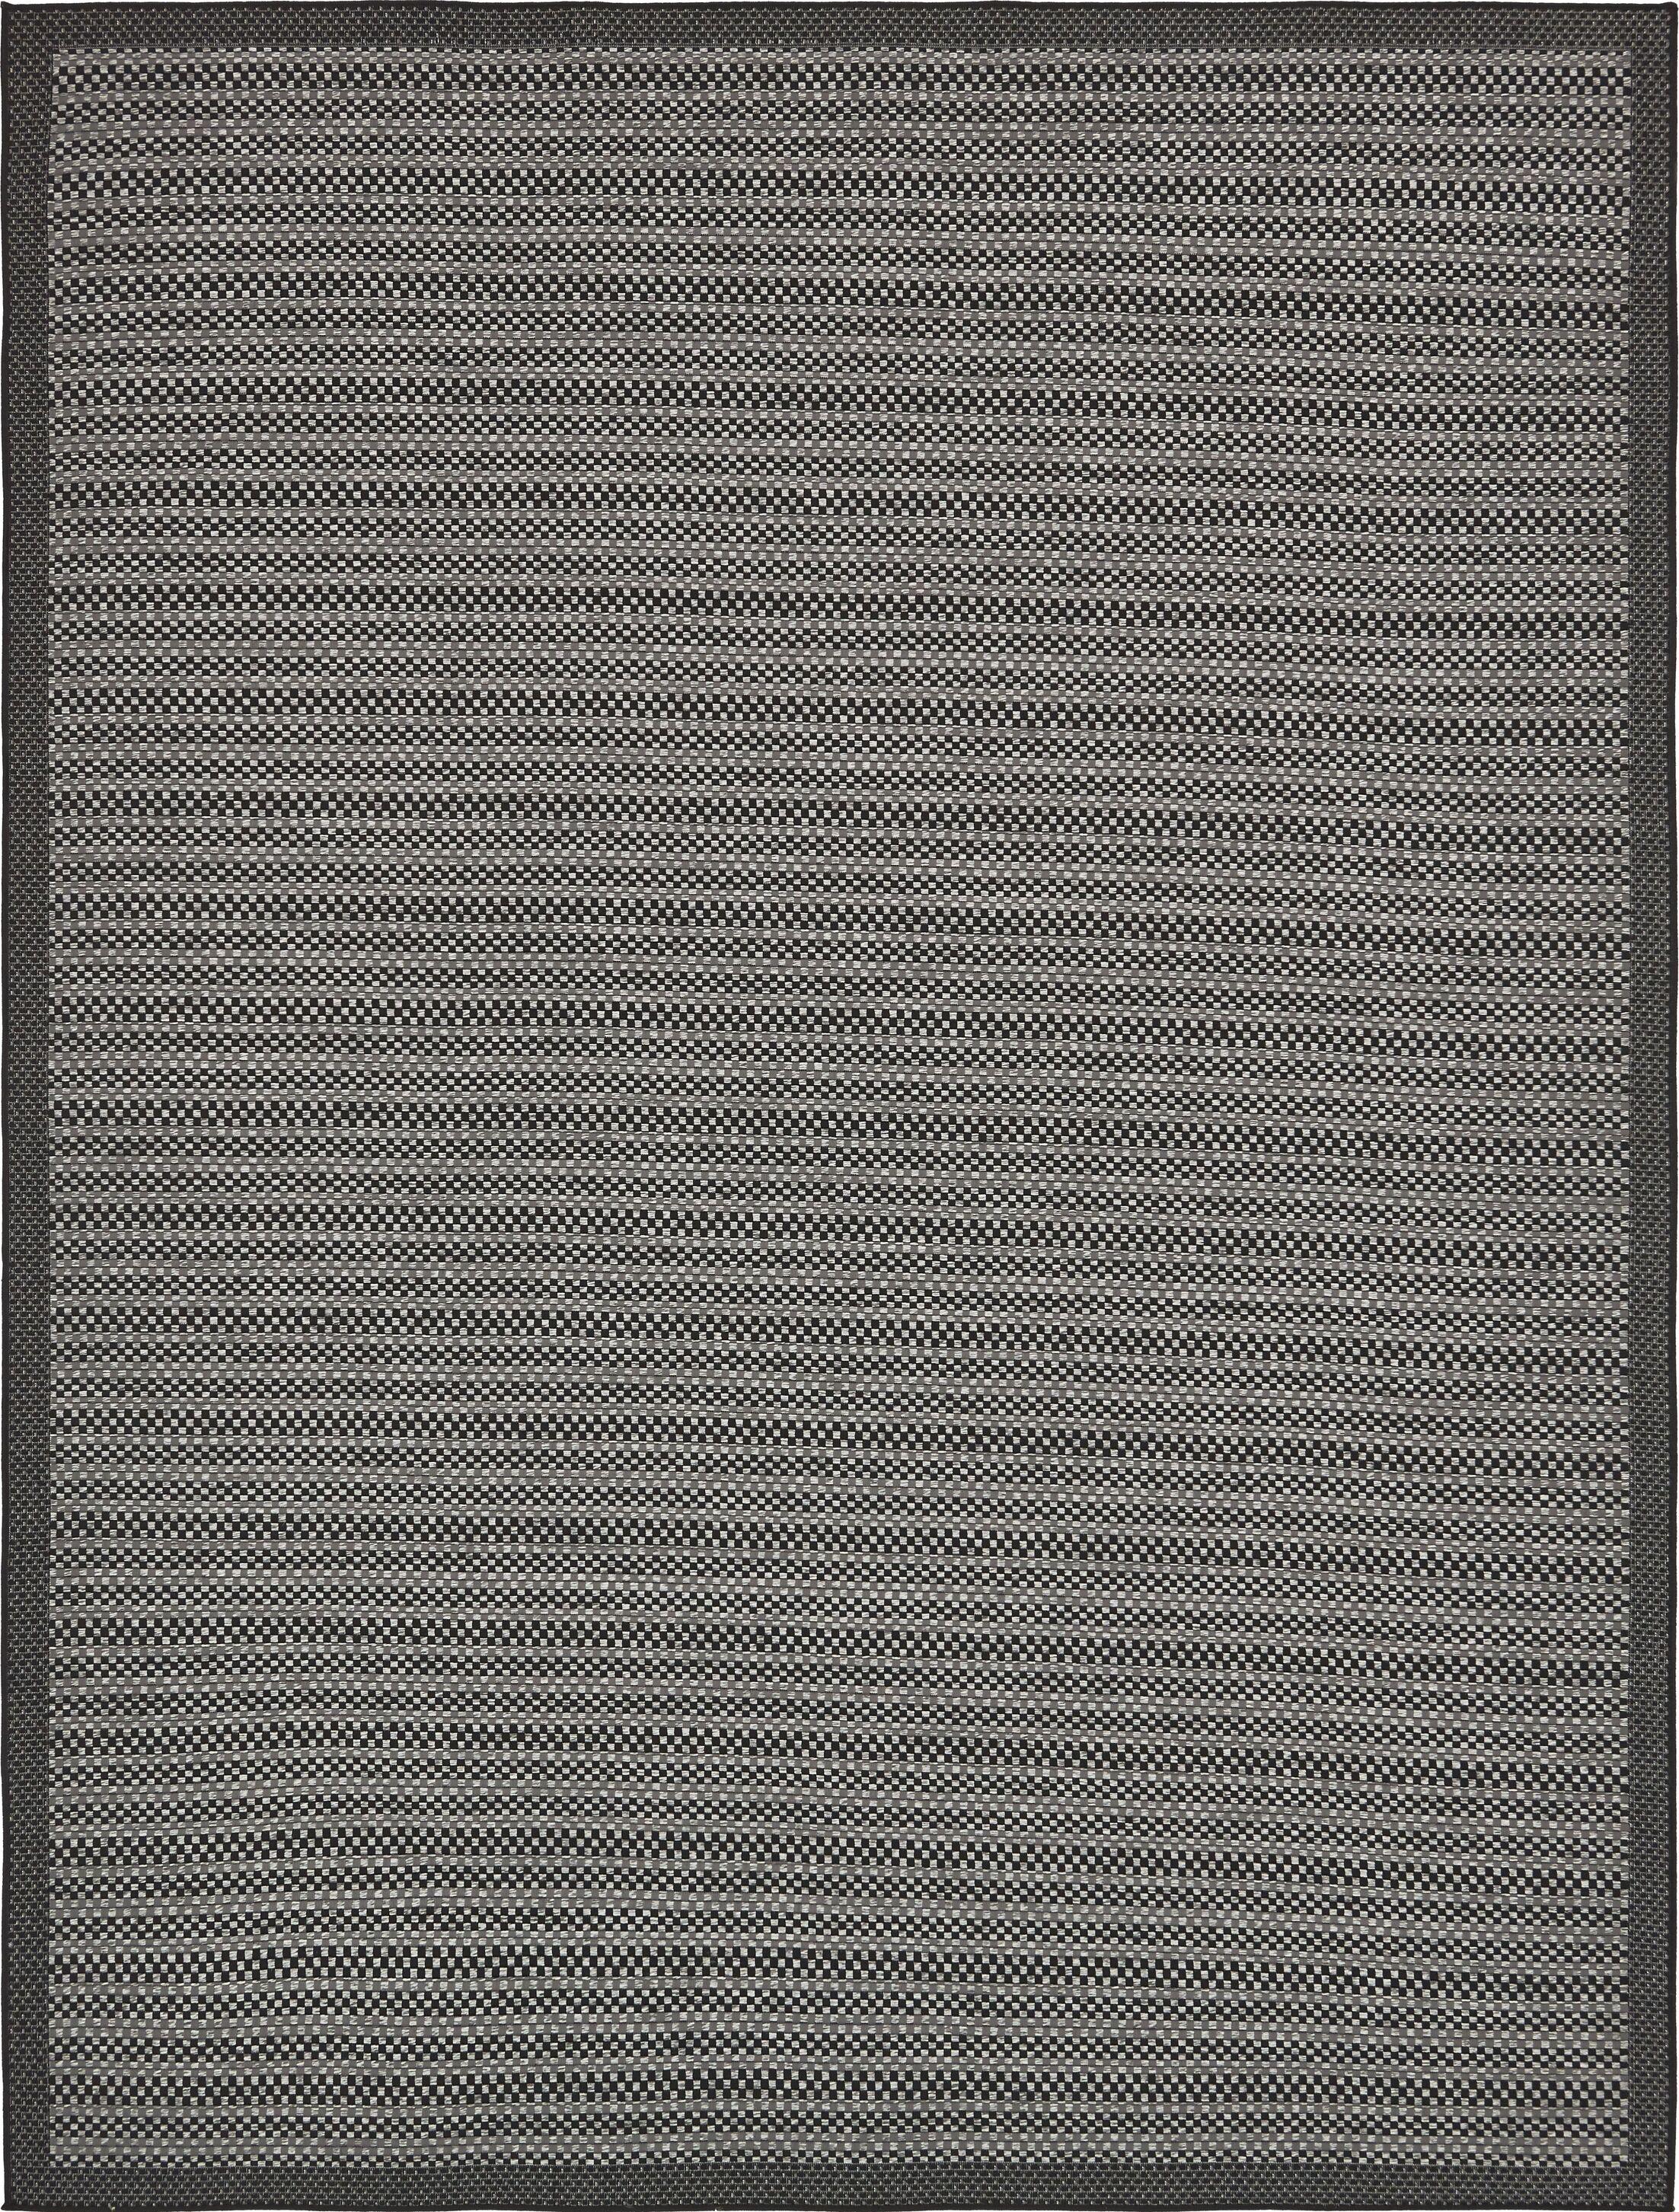 Dakota Gray Area Rug Rug Size: Rectangle 9' x 12'